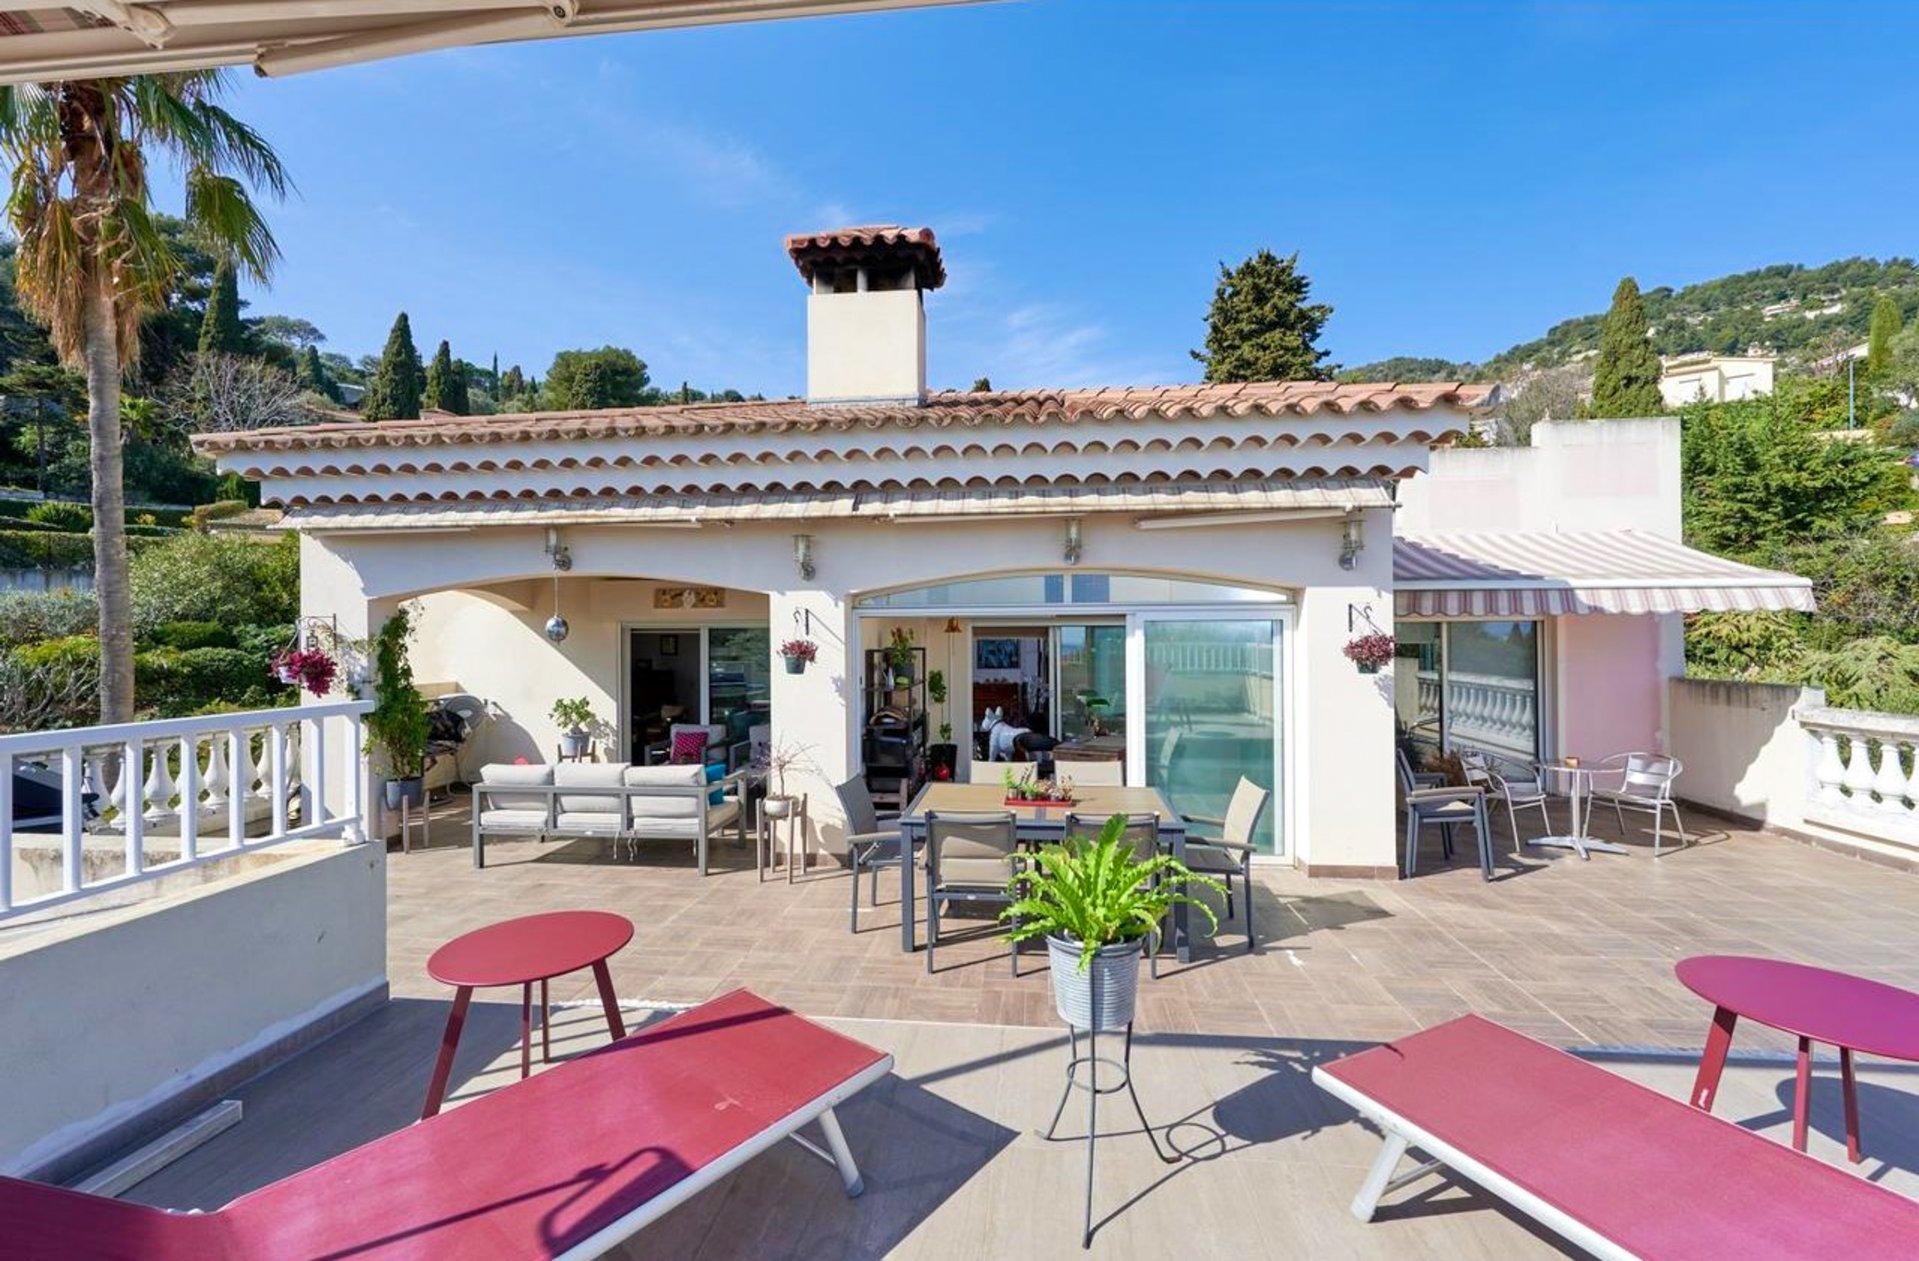 5:a med stora terrasser - Roquebrune Cap Martin